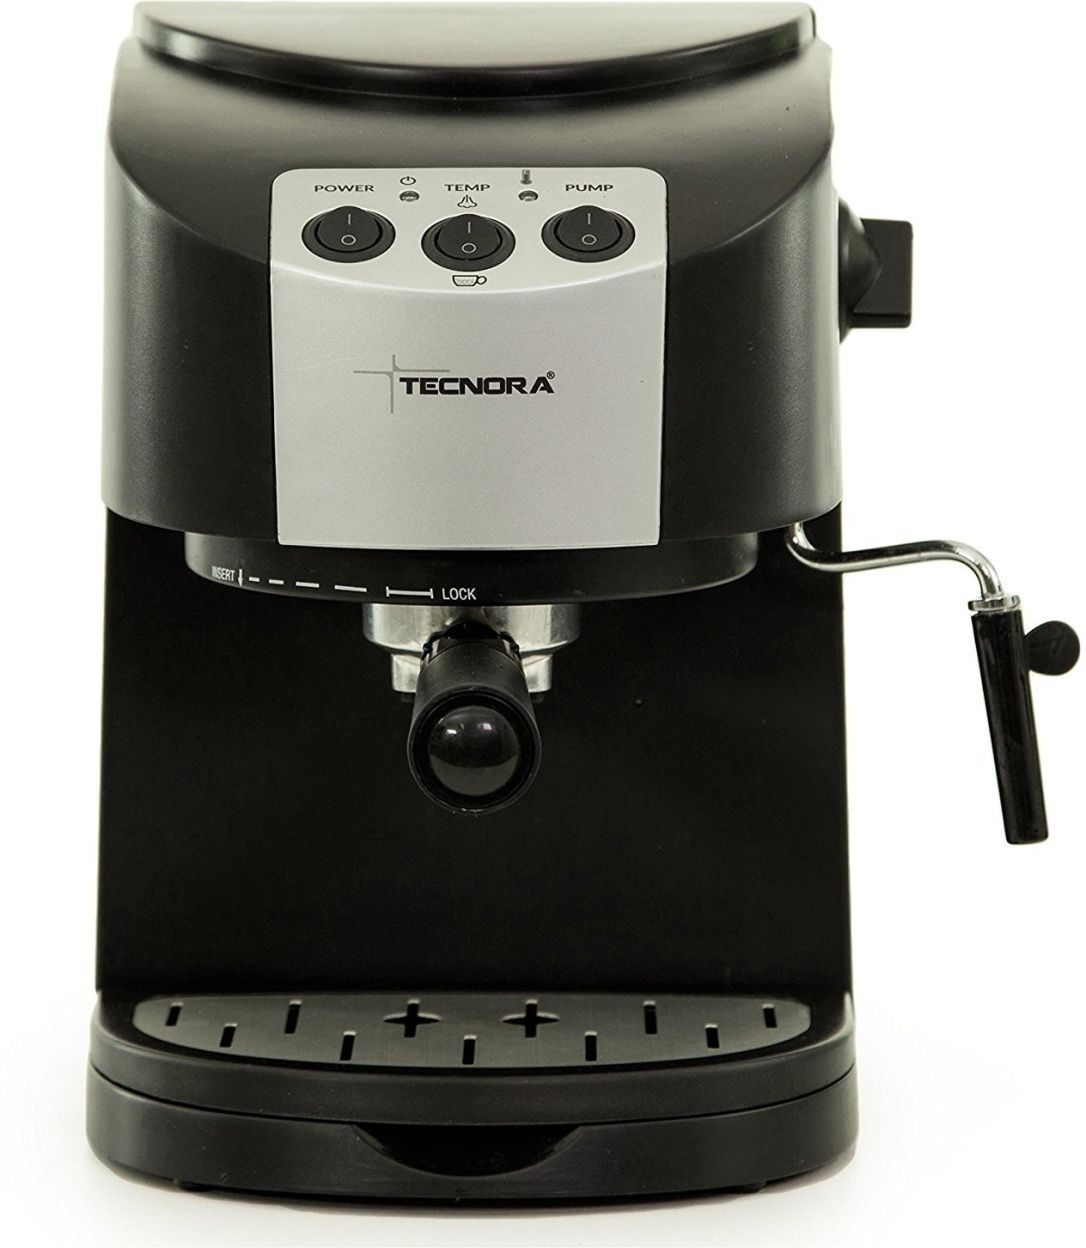 Topprice.in Price Comparison in India Coffee maker